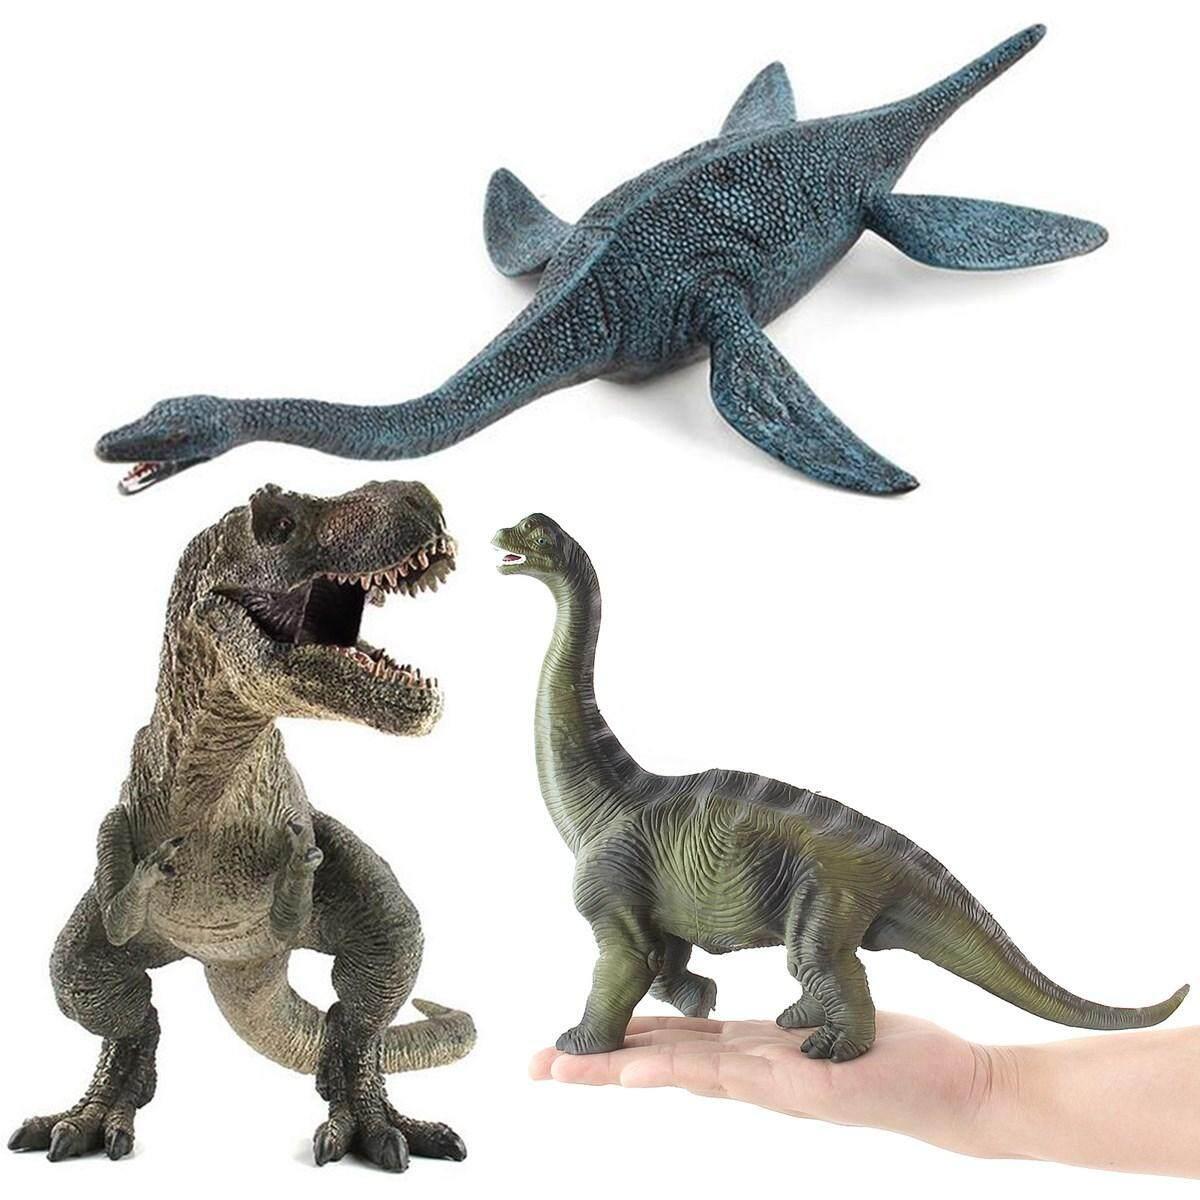 Toys & Hobbies 20cm Plesiosaur Realistic Dinosaur Animal Figure Solid Plastic Toy Model